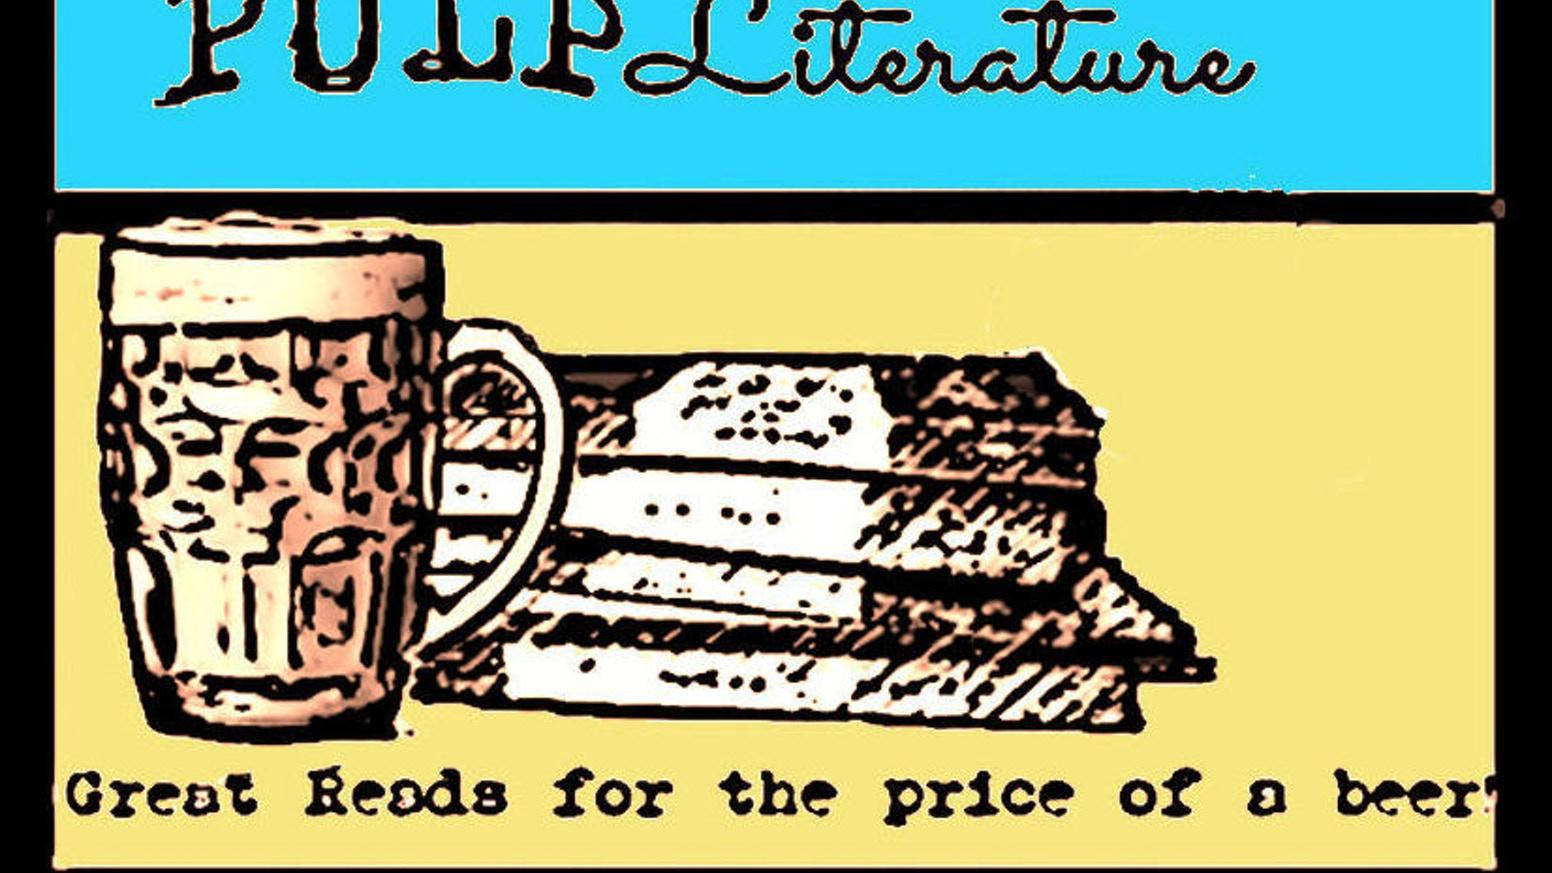 Bookshelf clipart genre. Pulp literature magazine by